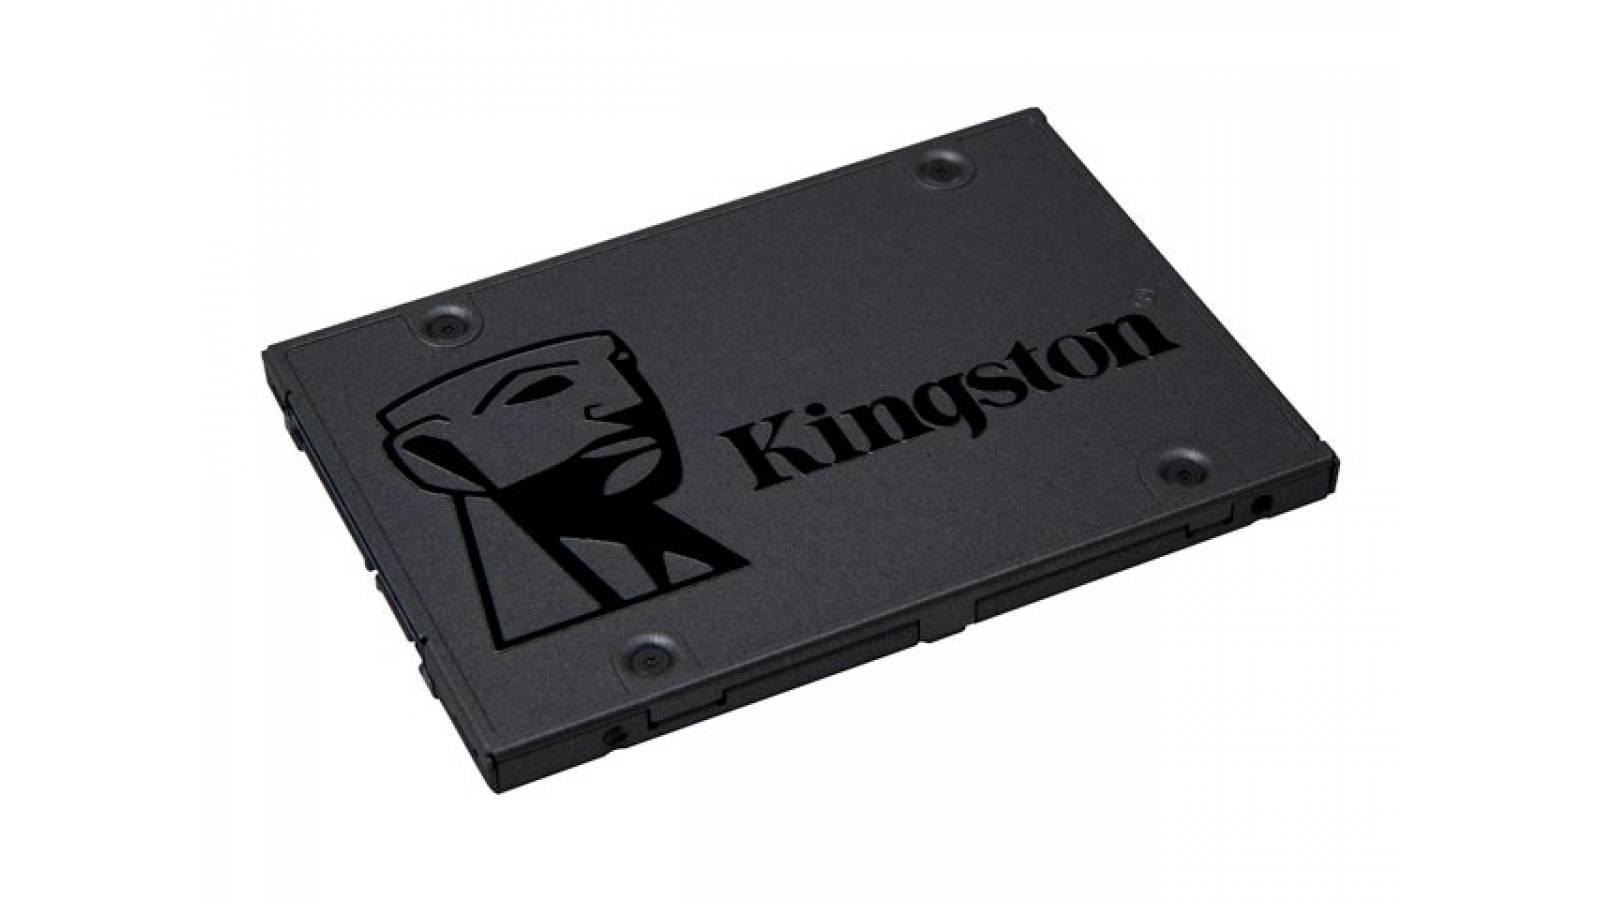 DISCO SOLIDO KINGSTON 480 GB SSDNOW A400 -SA400S37/480G